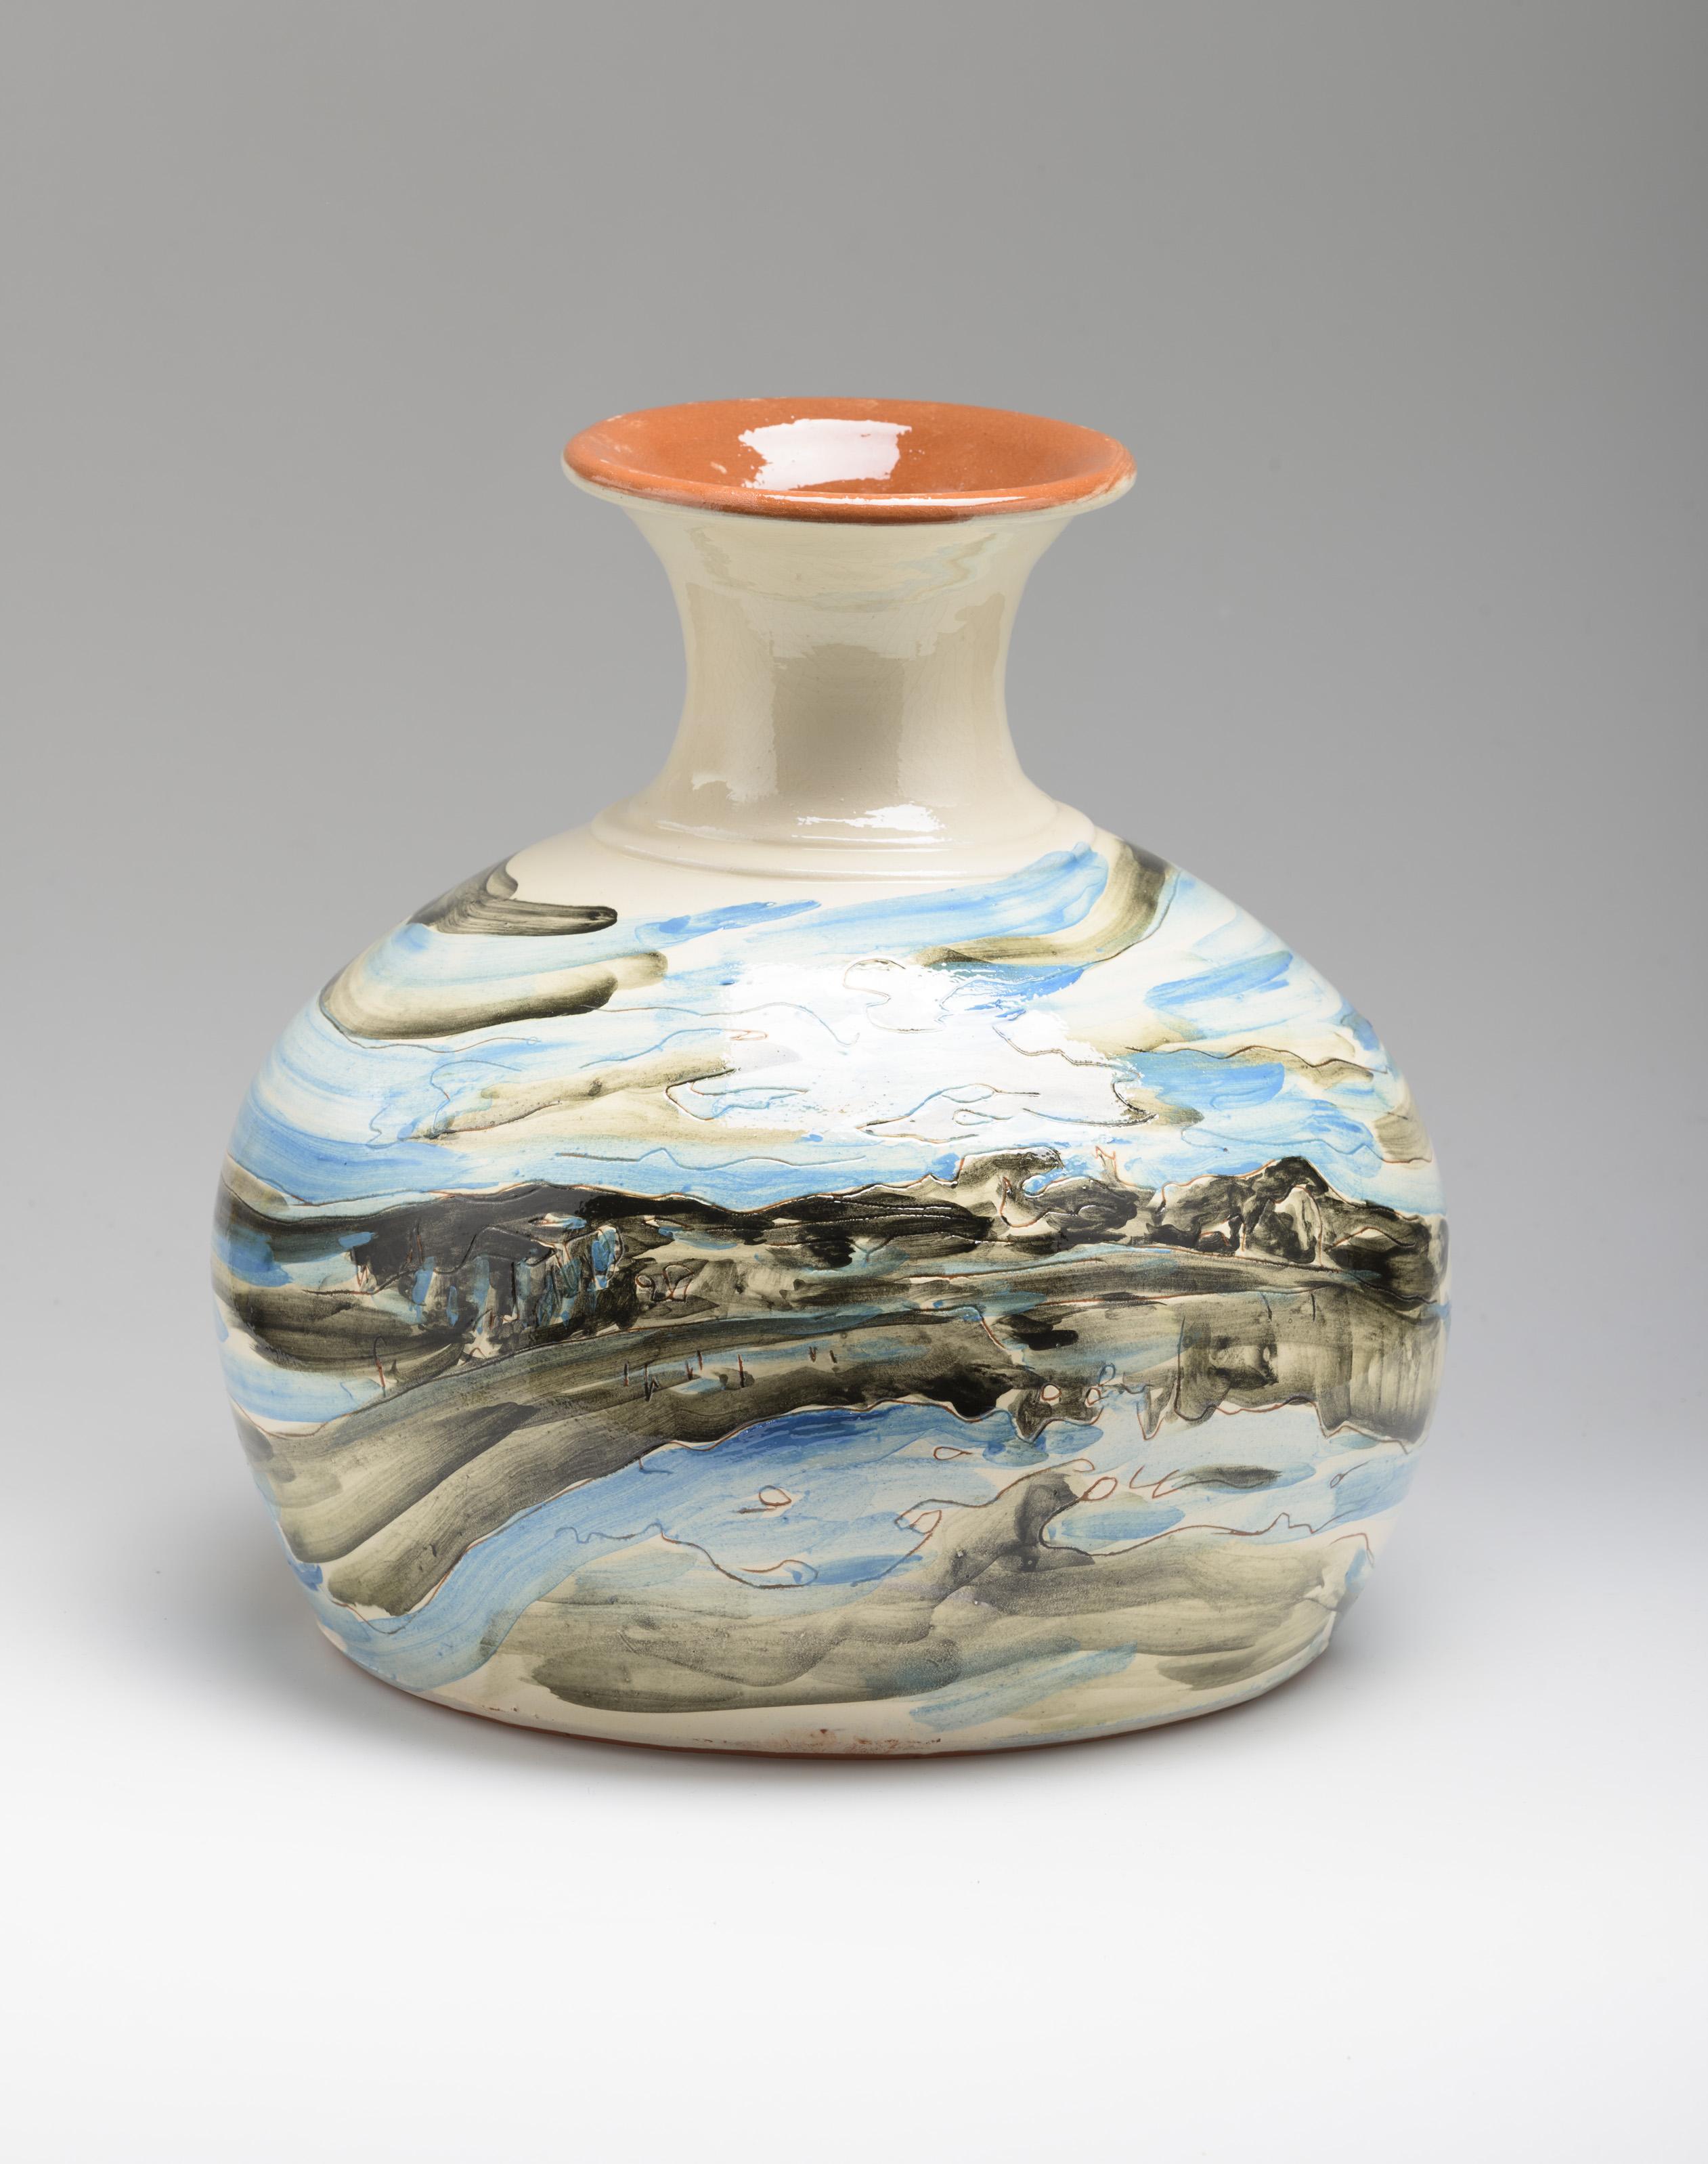 Ceramic Works - Ingrid Simons